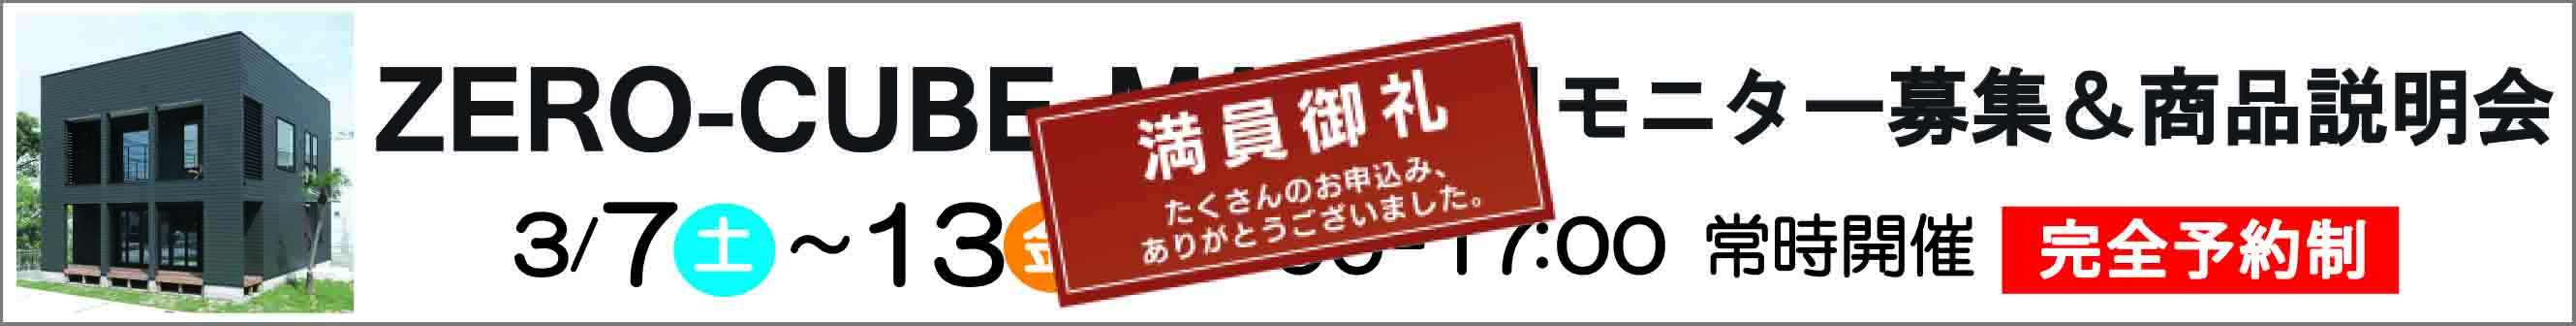 ZERO-CUBEMALIBUモニター募集&商品説明会開催